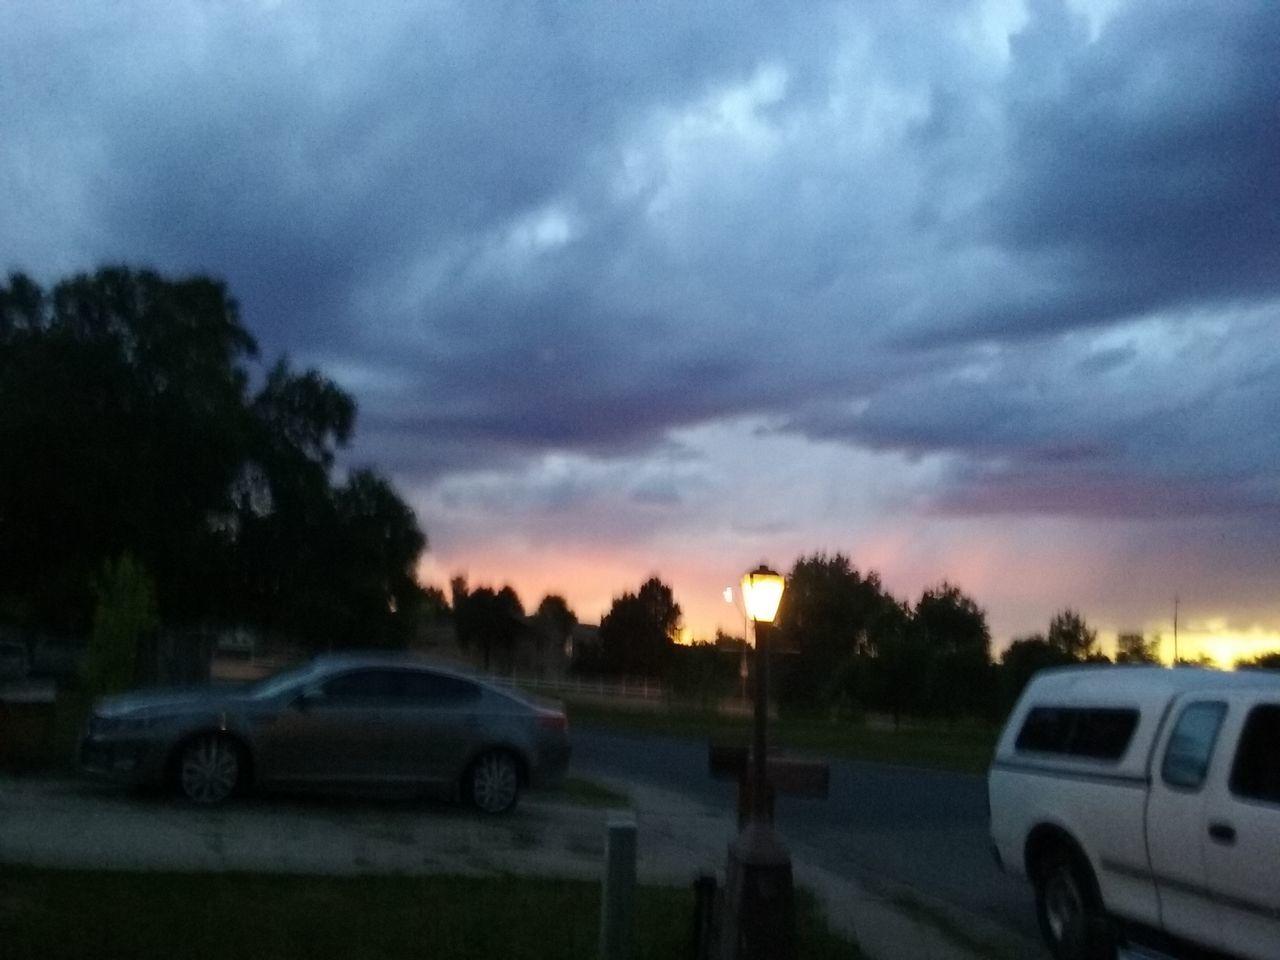 car, sunset, land vehicle, sky, transportation, road, mode of transport, dusk, cloud - sky, sun, tree, nature, no people, outdoors, storm cloud, day